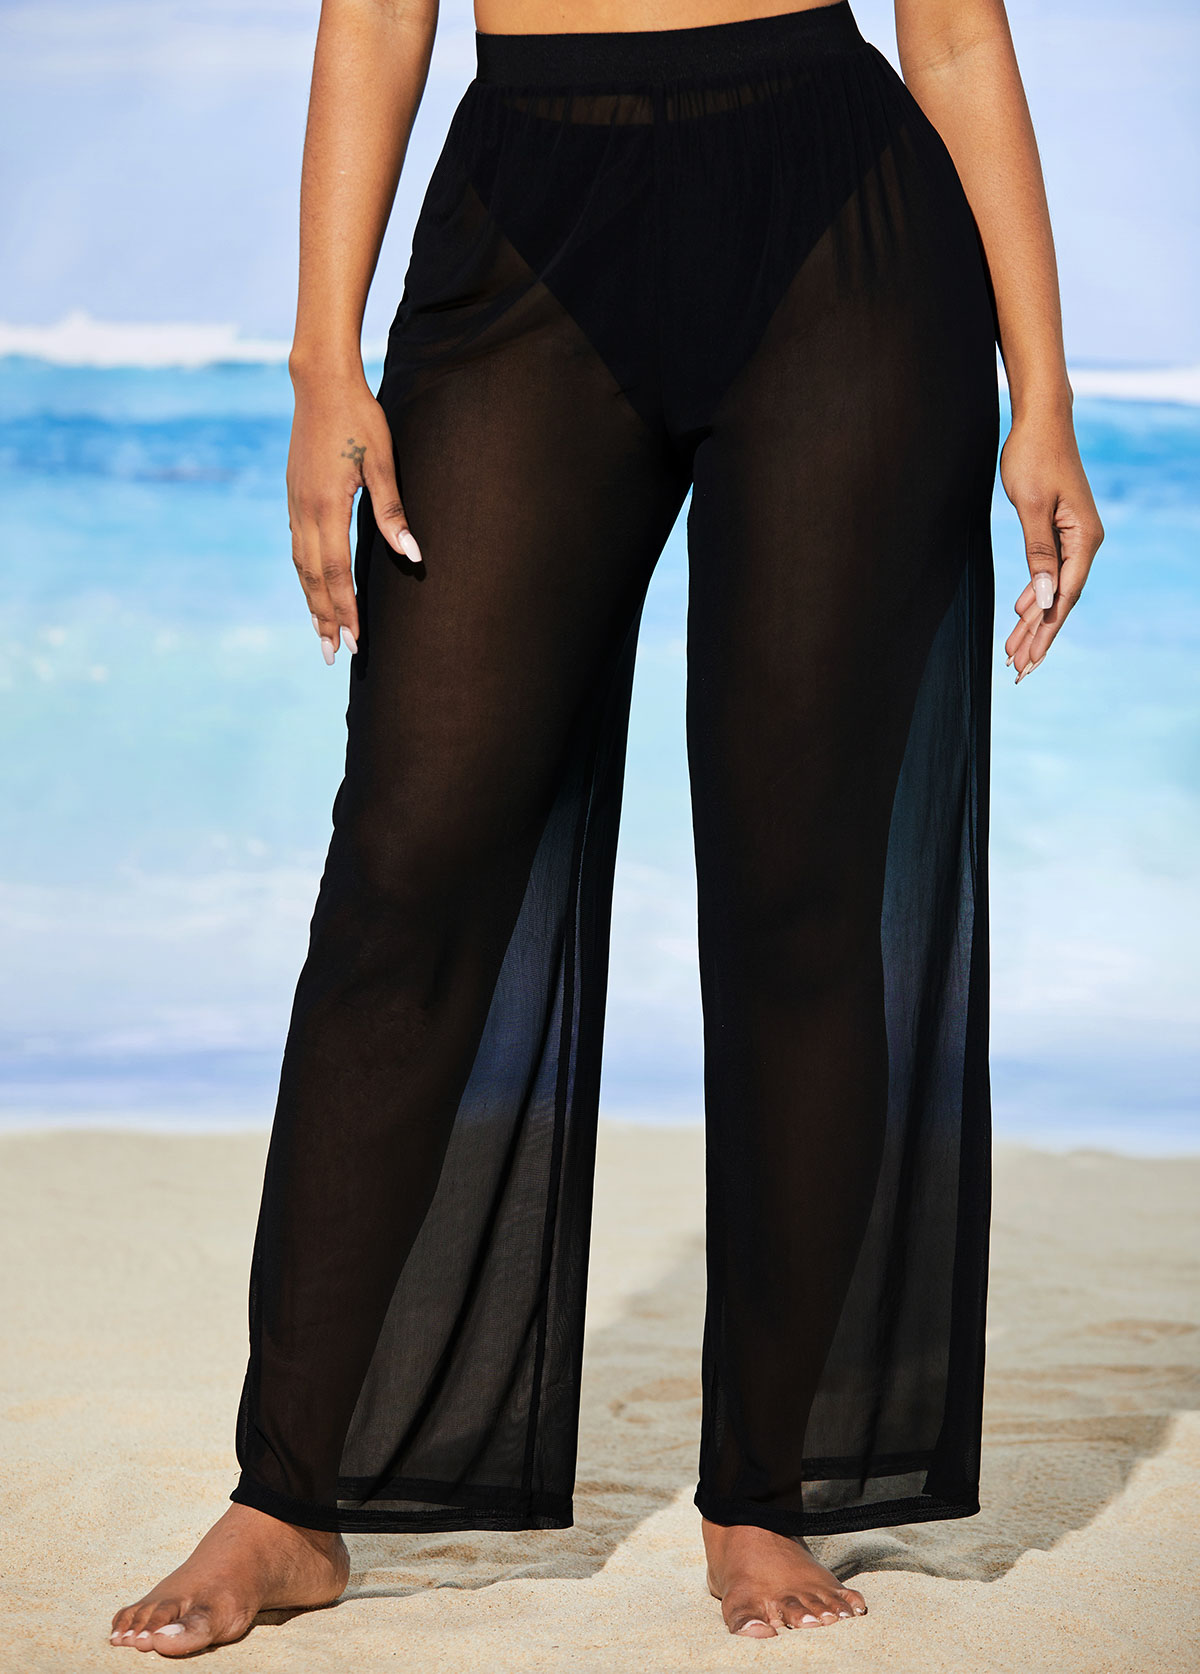 Mesh High Waisted Solid Beach Pants